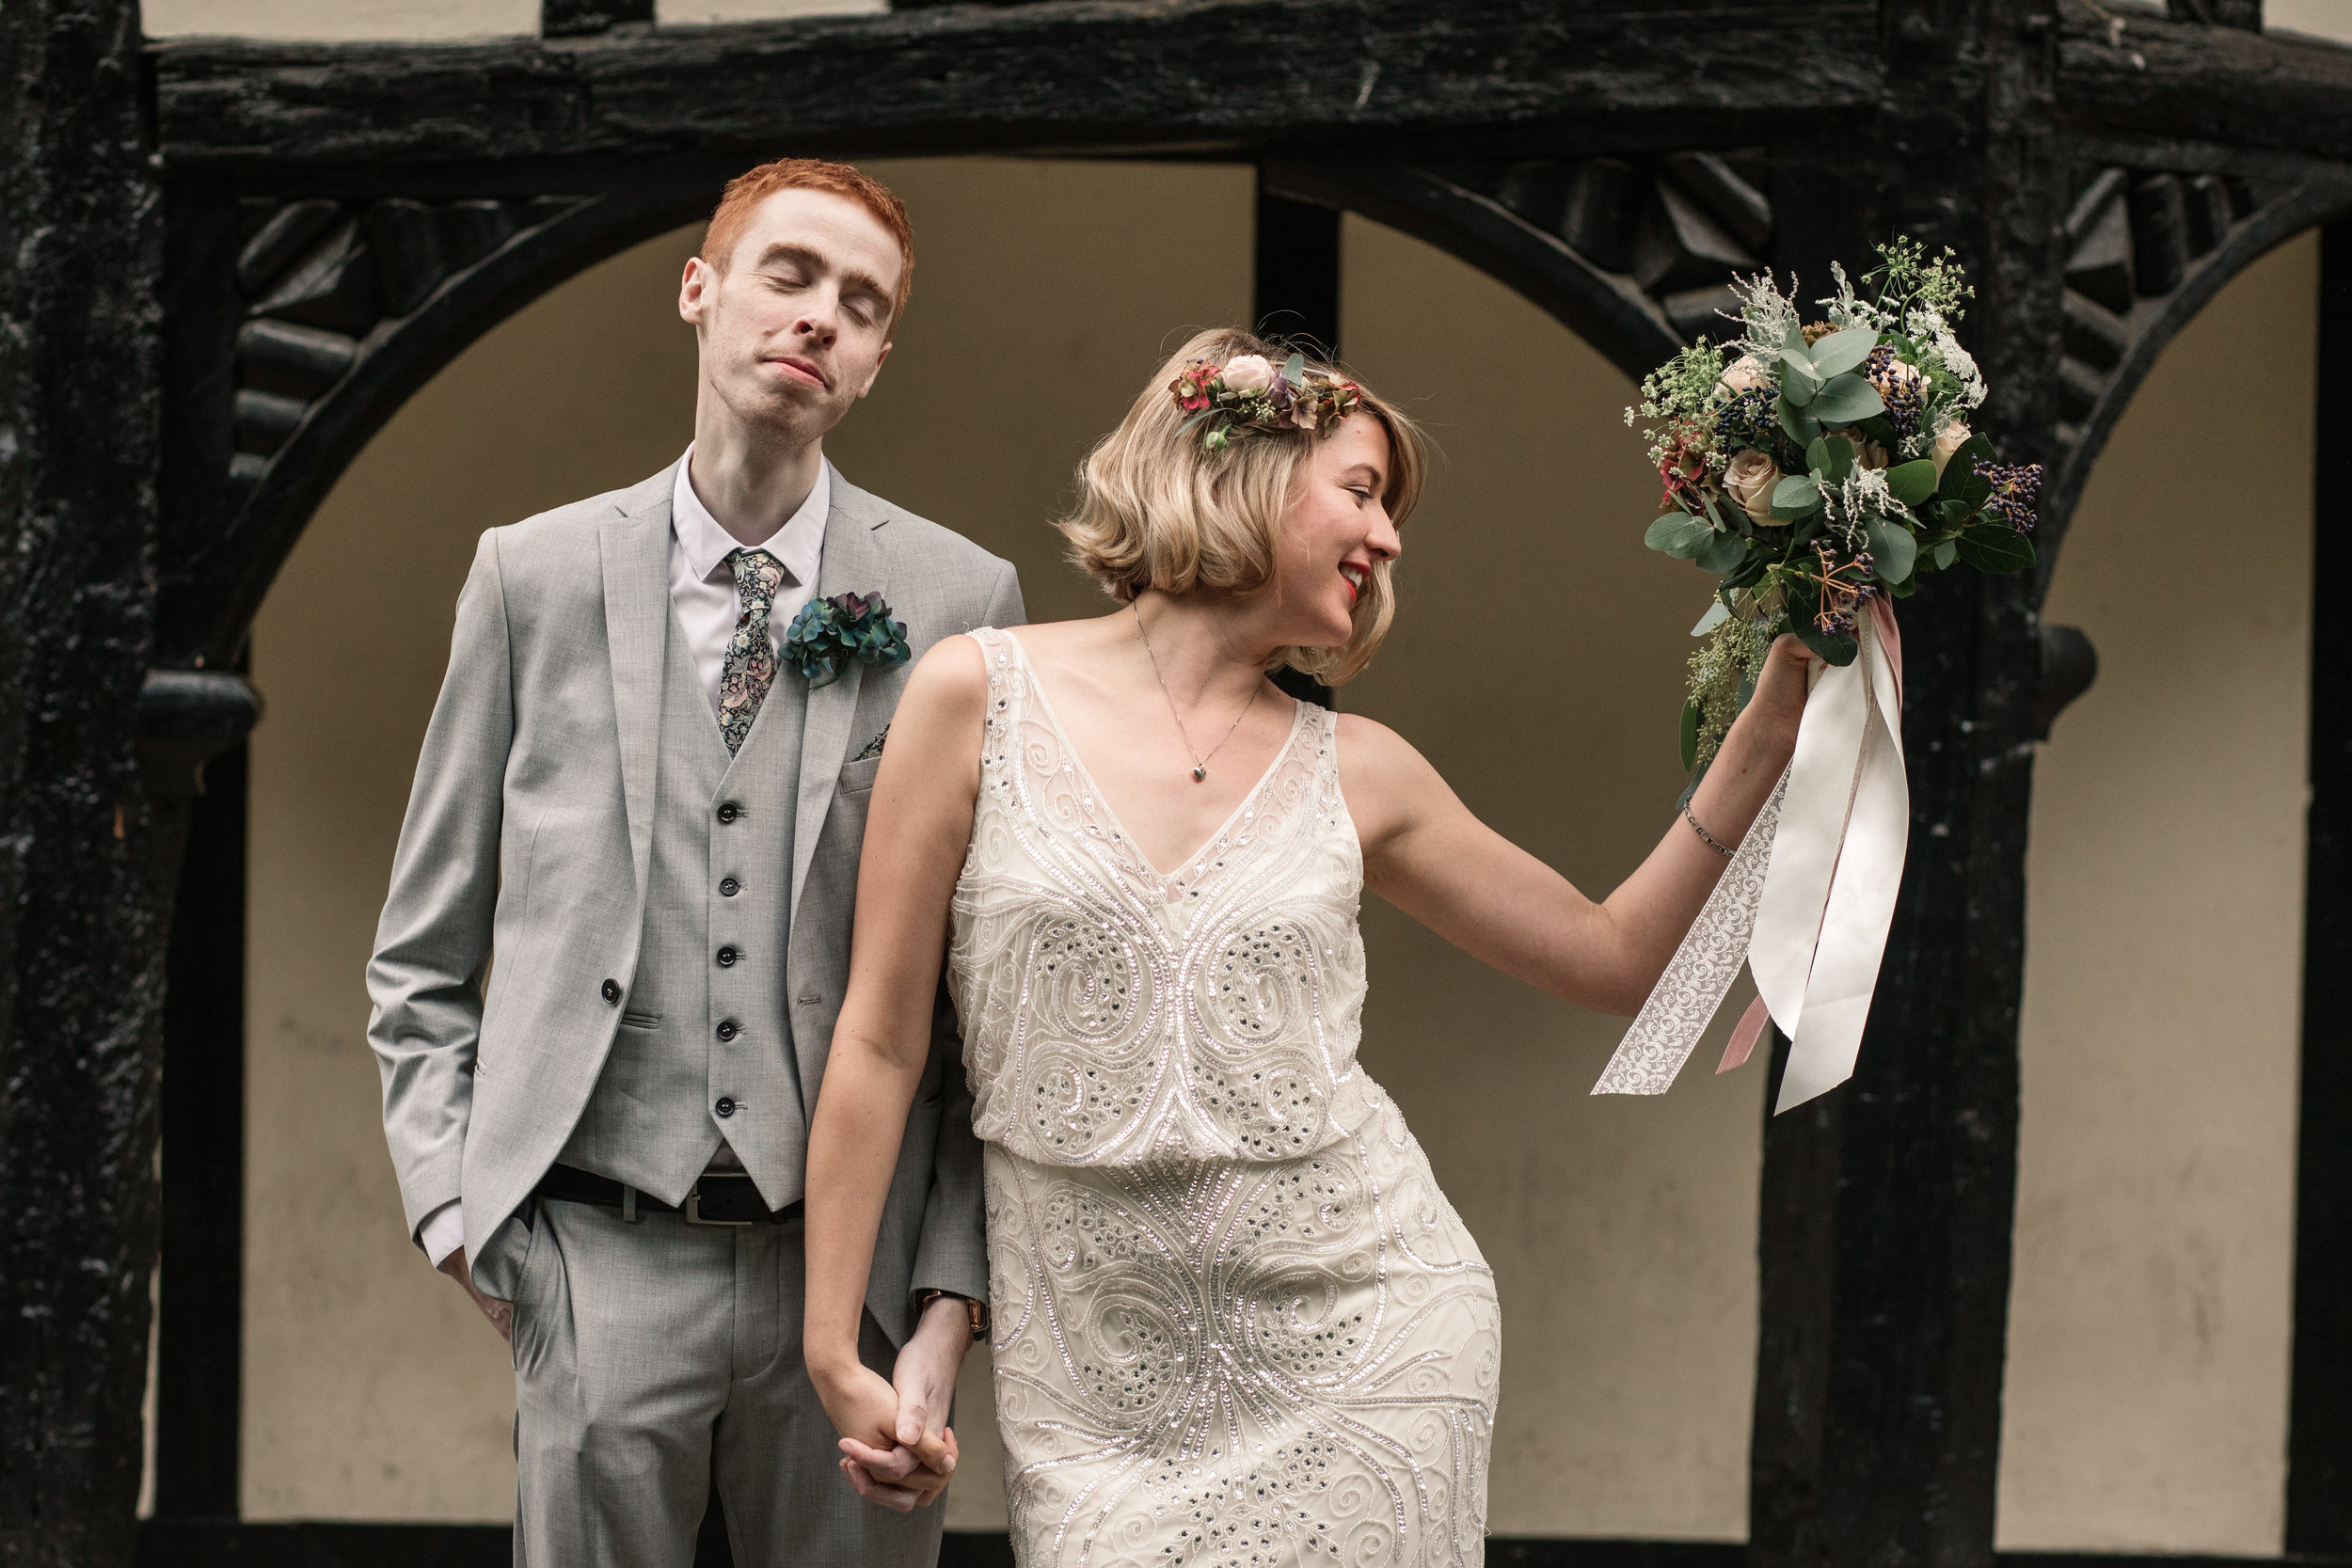 becky-harley-photography-hertfordshire-wedding-photographer-003.JPG